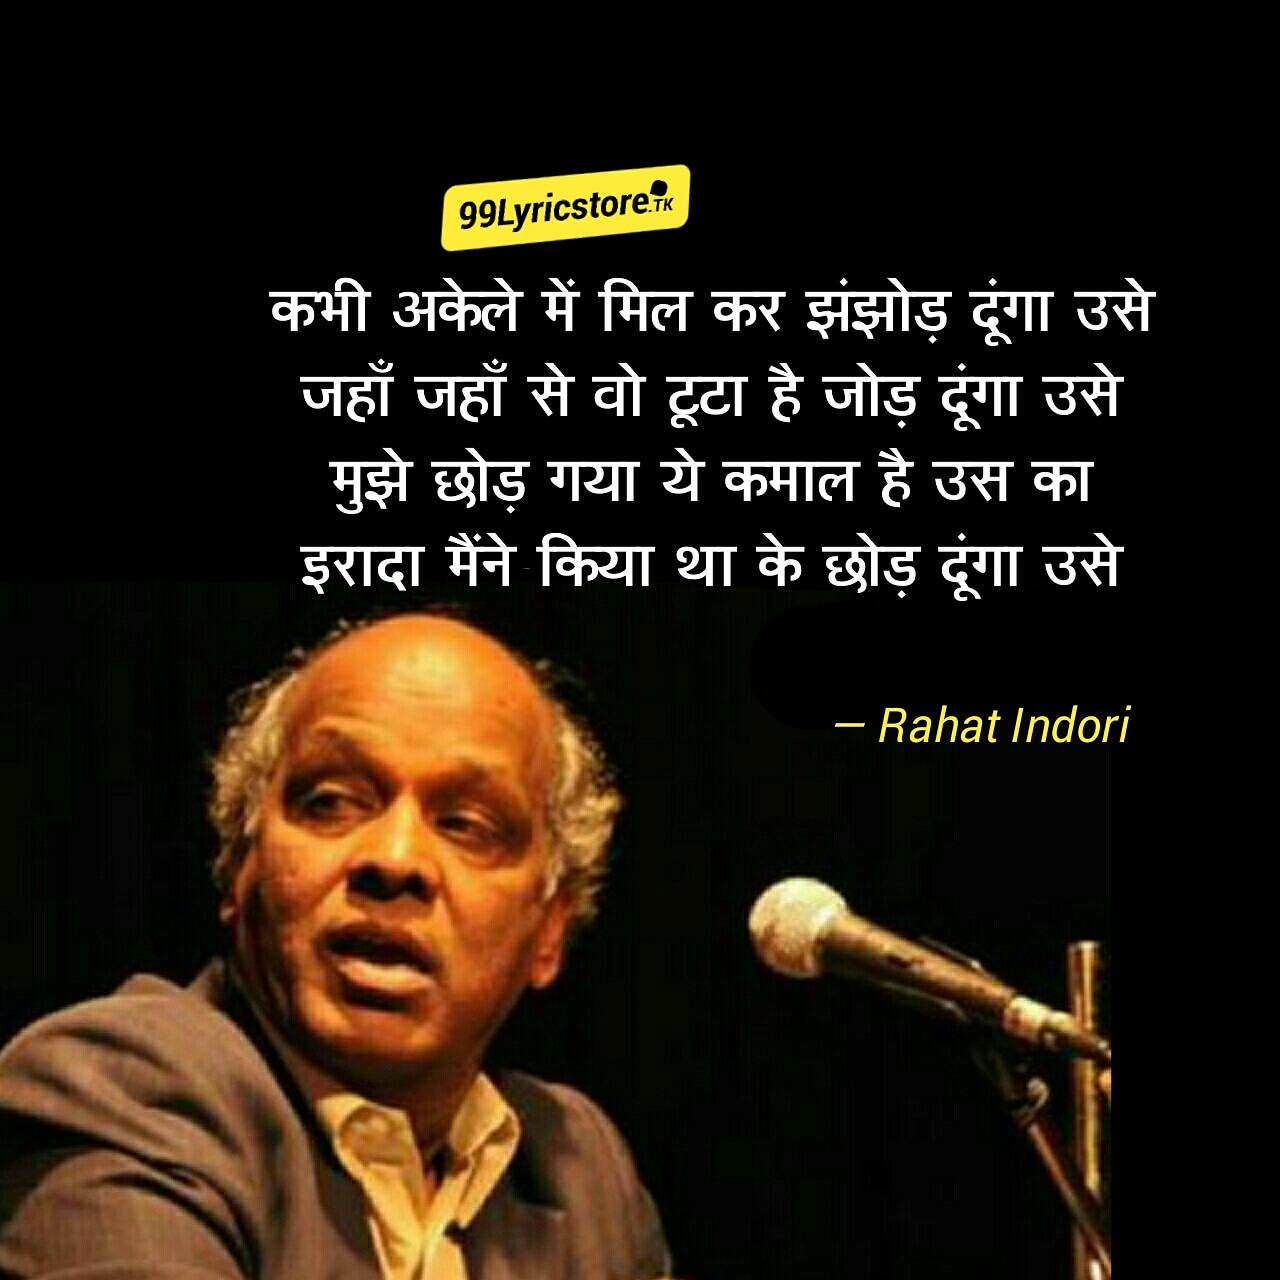 Kabhi Akele Me Mil Kar Jhanjhor Doonga Use - Rahat Indori